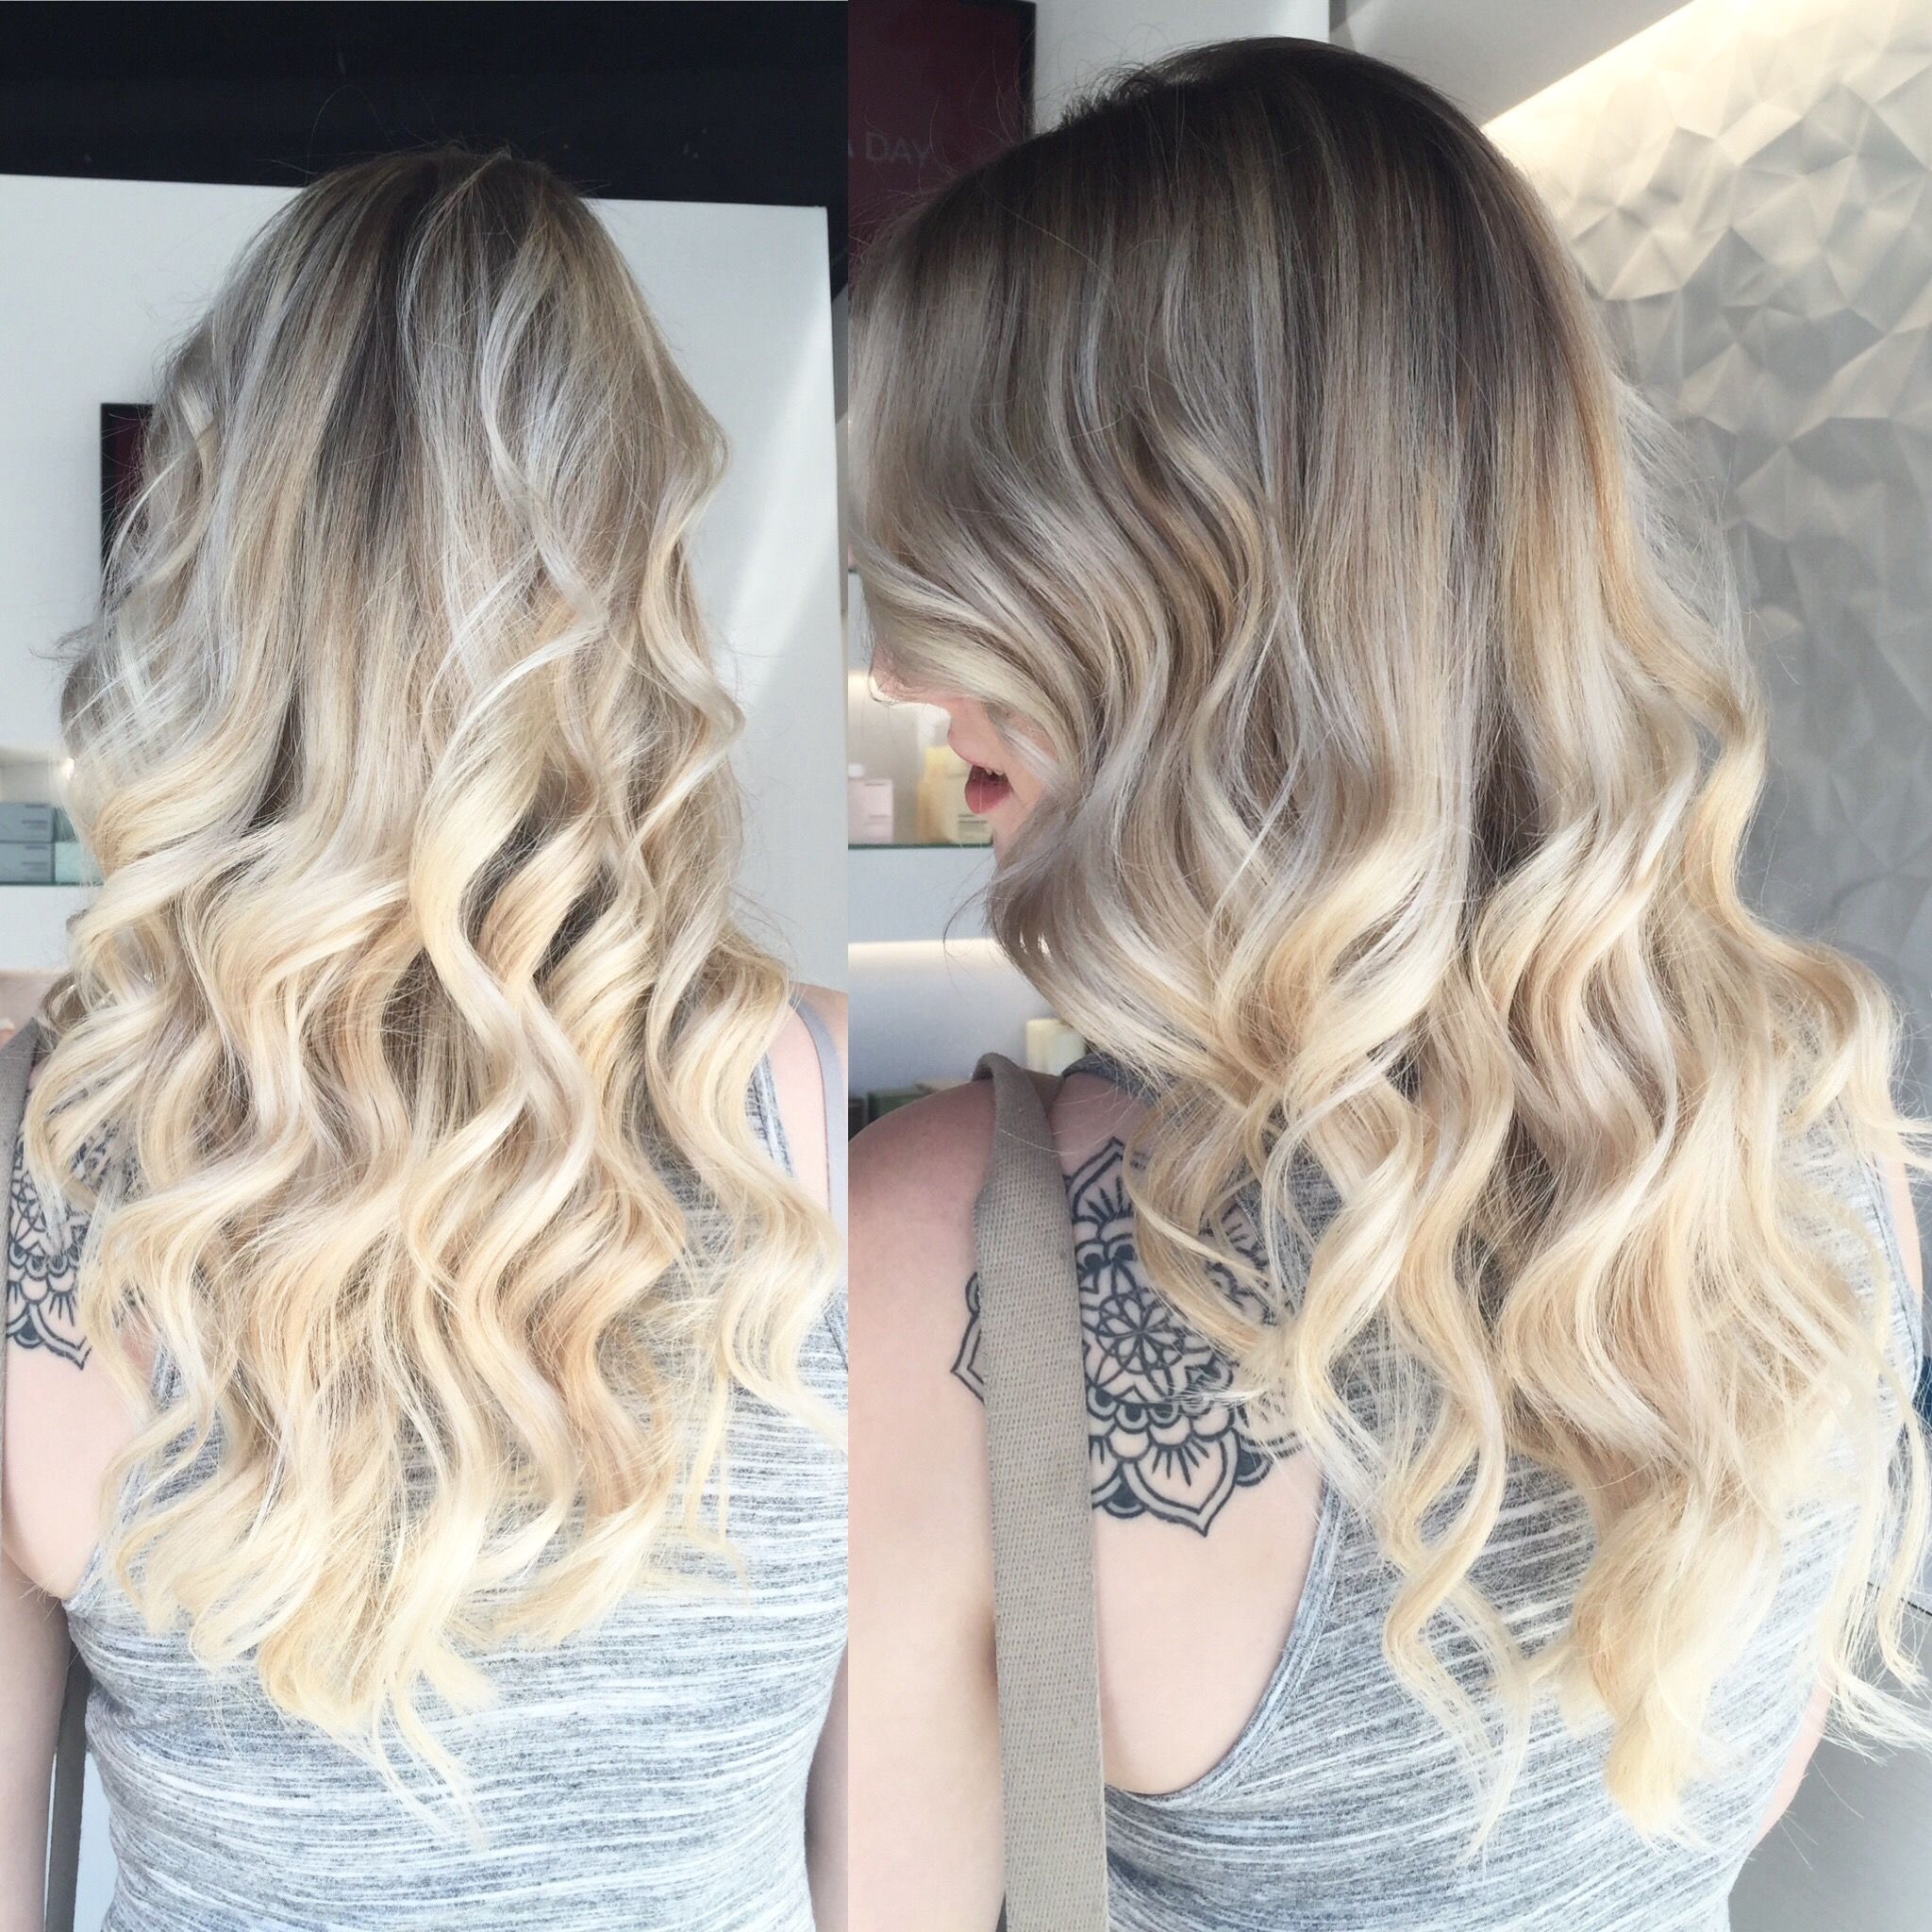 #SeniorStylist #MauraSantostefano gave our client Jenna stunning bright blonde #balayage highlights for summer! #blonde #ottawa #oldottawasouth #ottawasalon #HRBL #behindthechair BehindTheChair.com